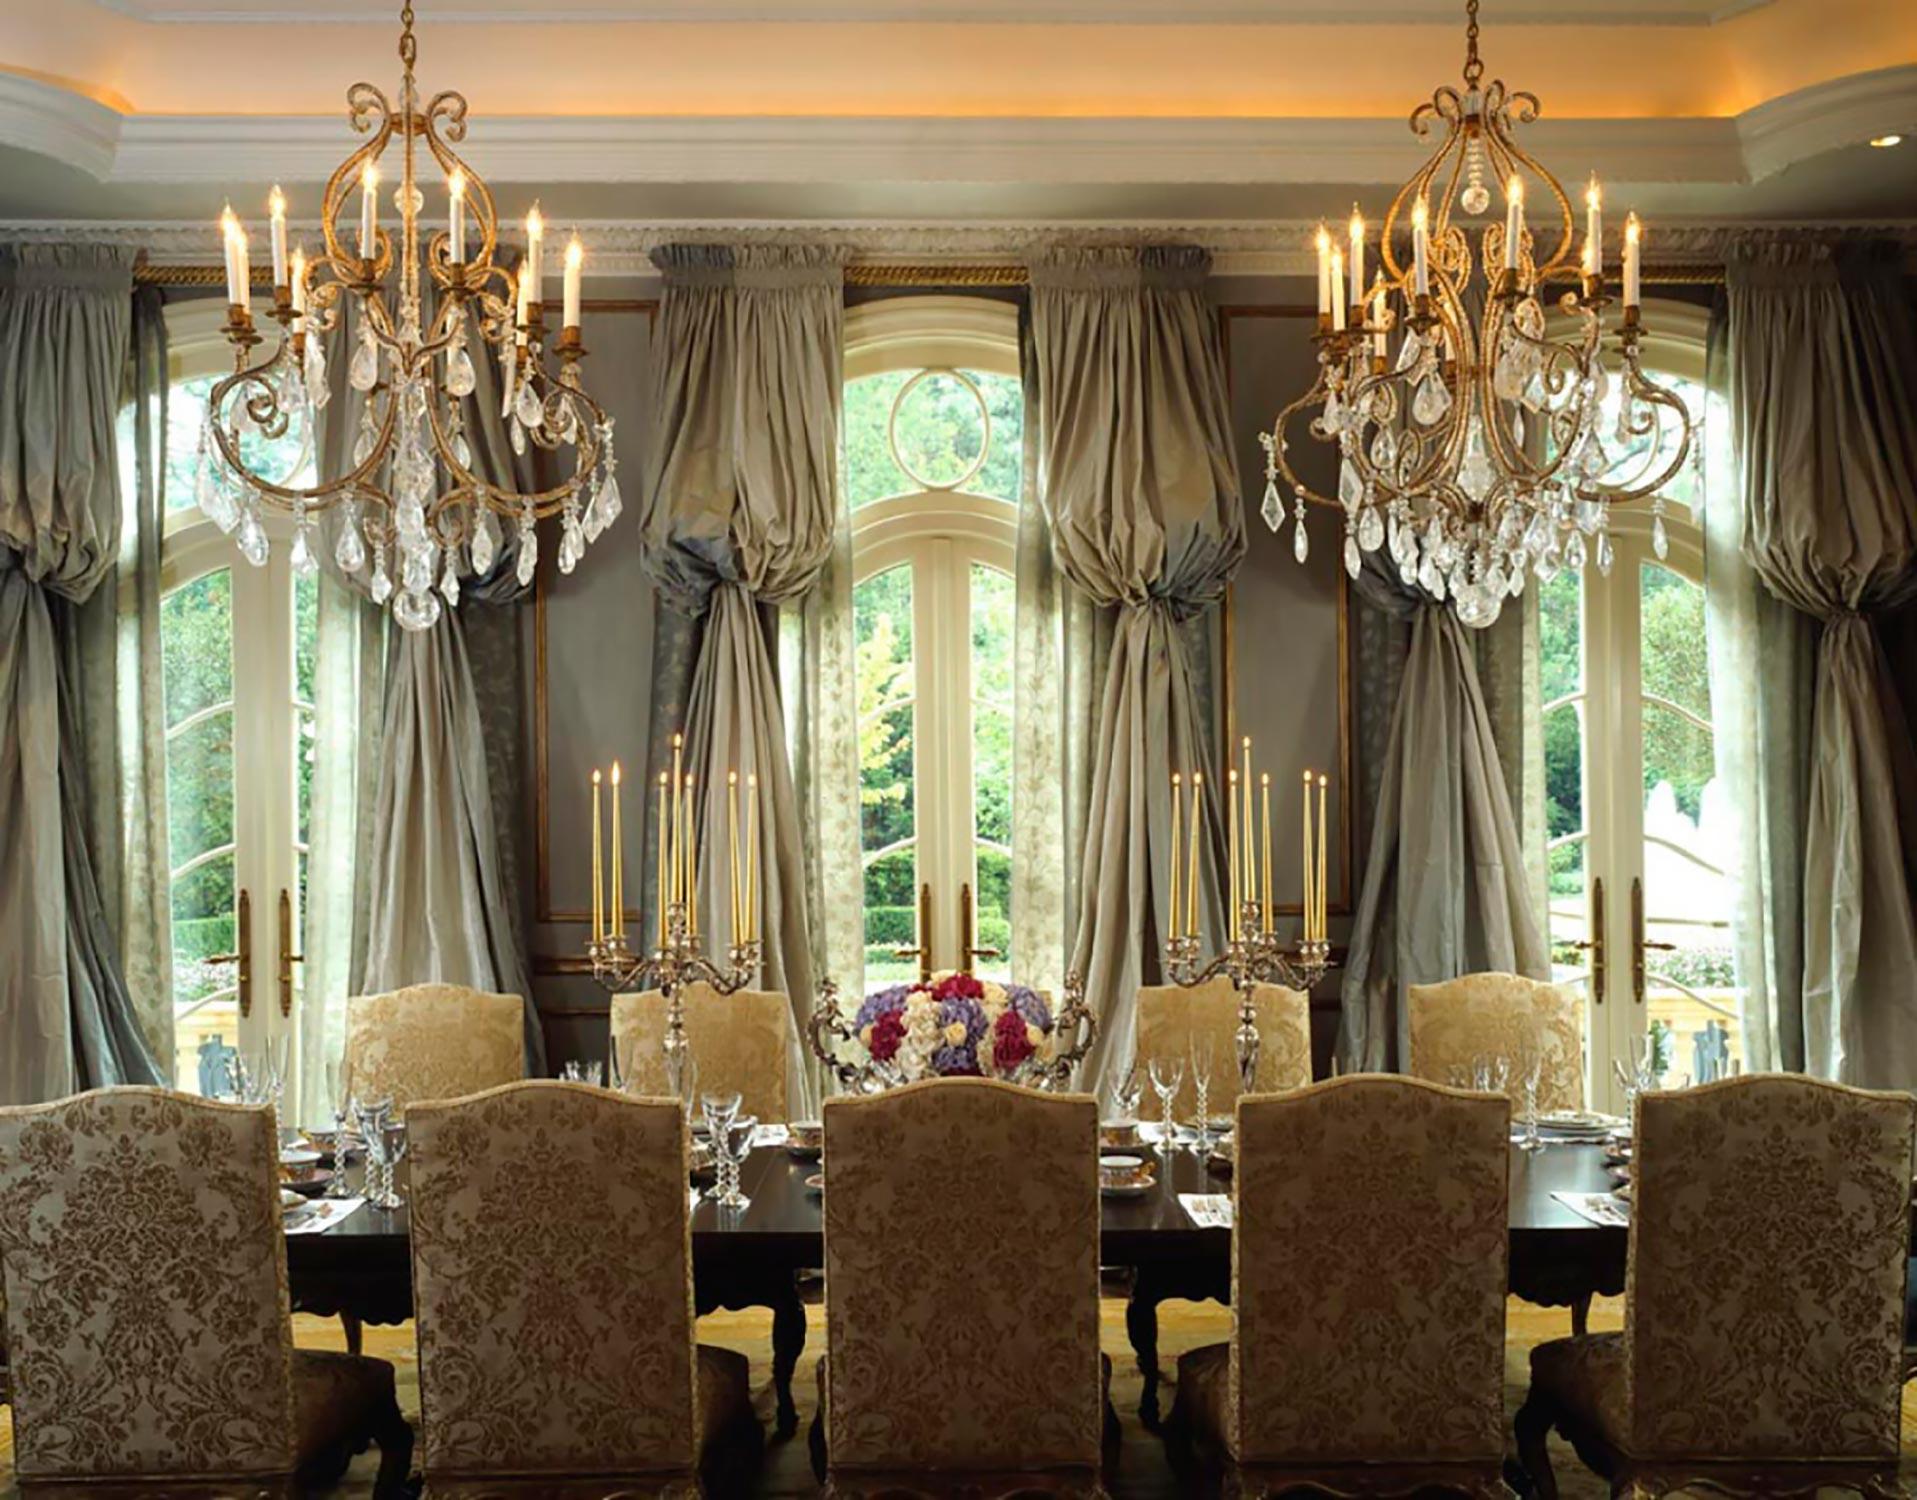 window treatments  Interior Design: Howard Design Group